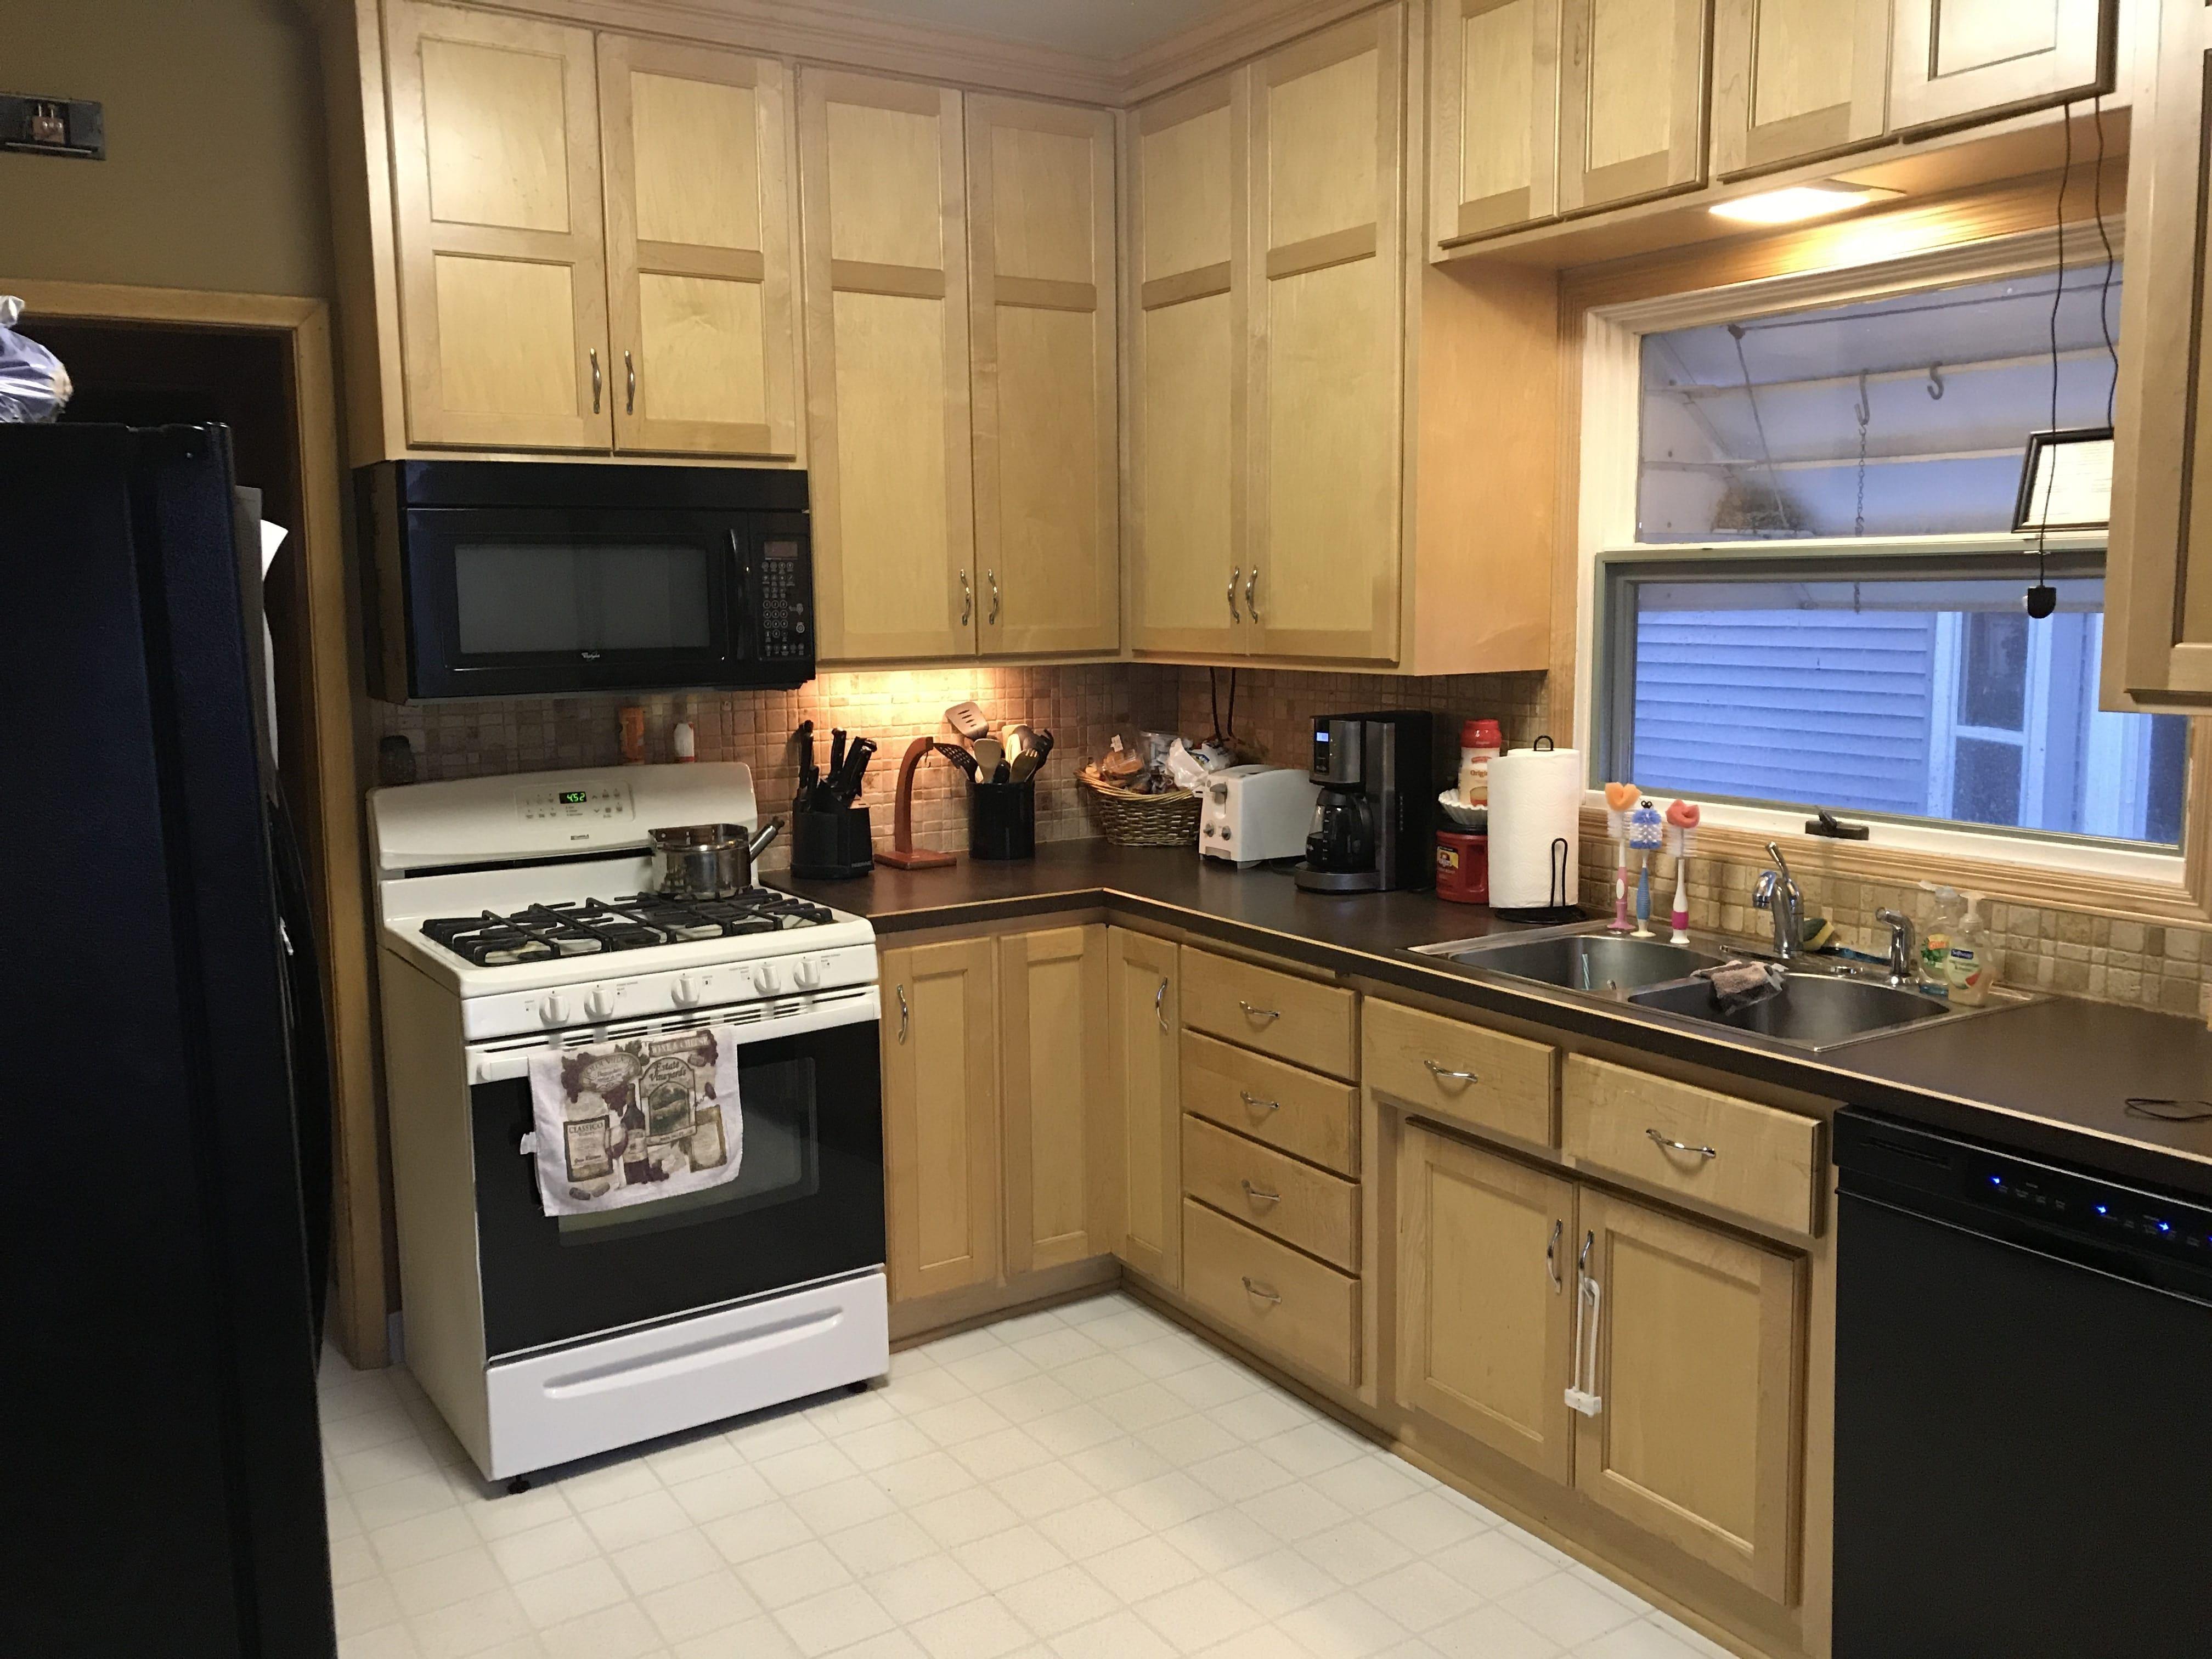 Kelly's Place Kitchen